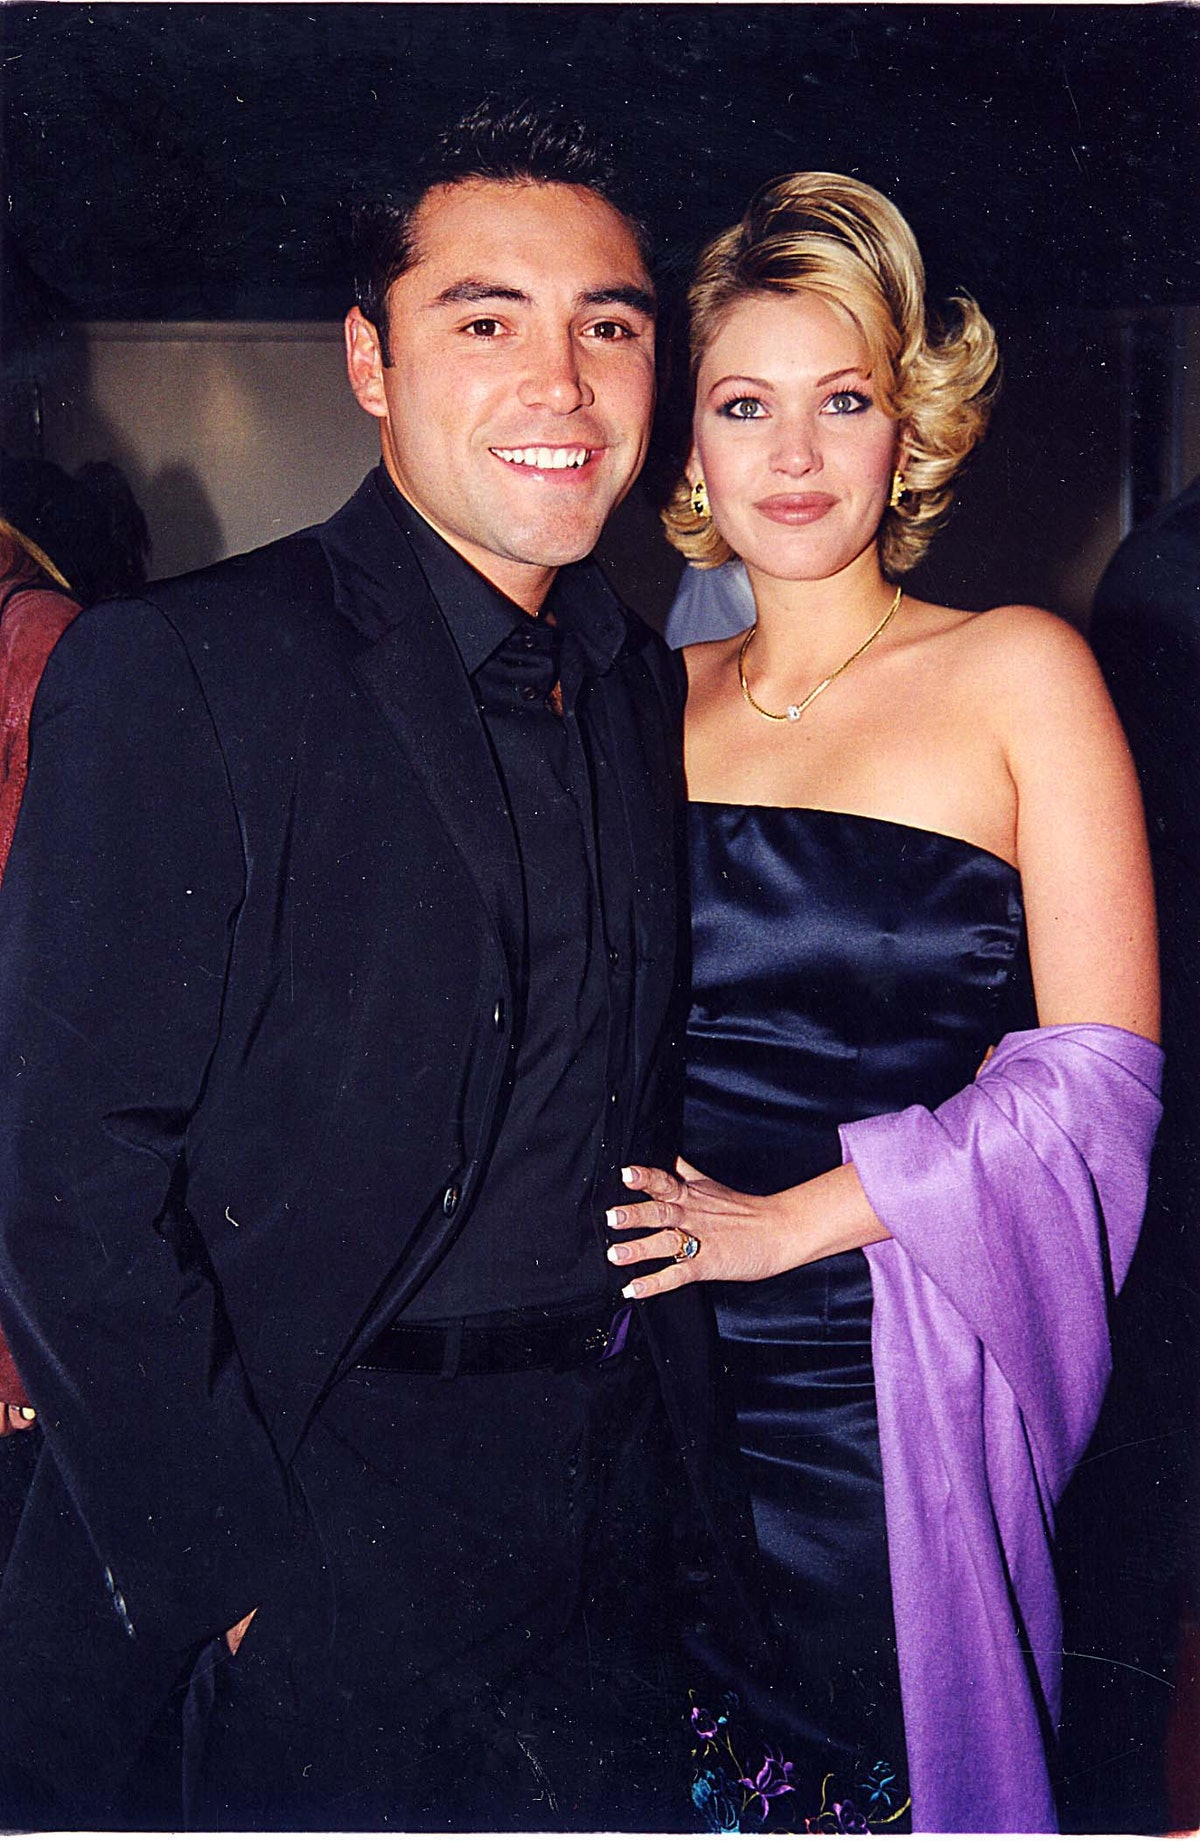 Oscar de la Hoya & Shanna Moakler during 1999 Billboard Awards in Las Vegas, Nevada, United States. (Photo by Jeff Kravitz/FilmMagic, Inc)